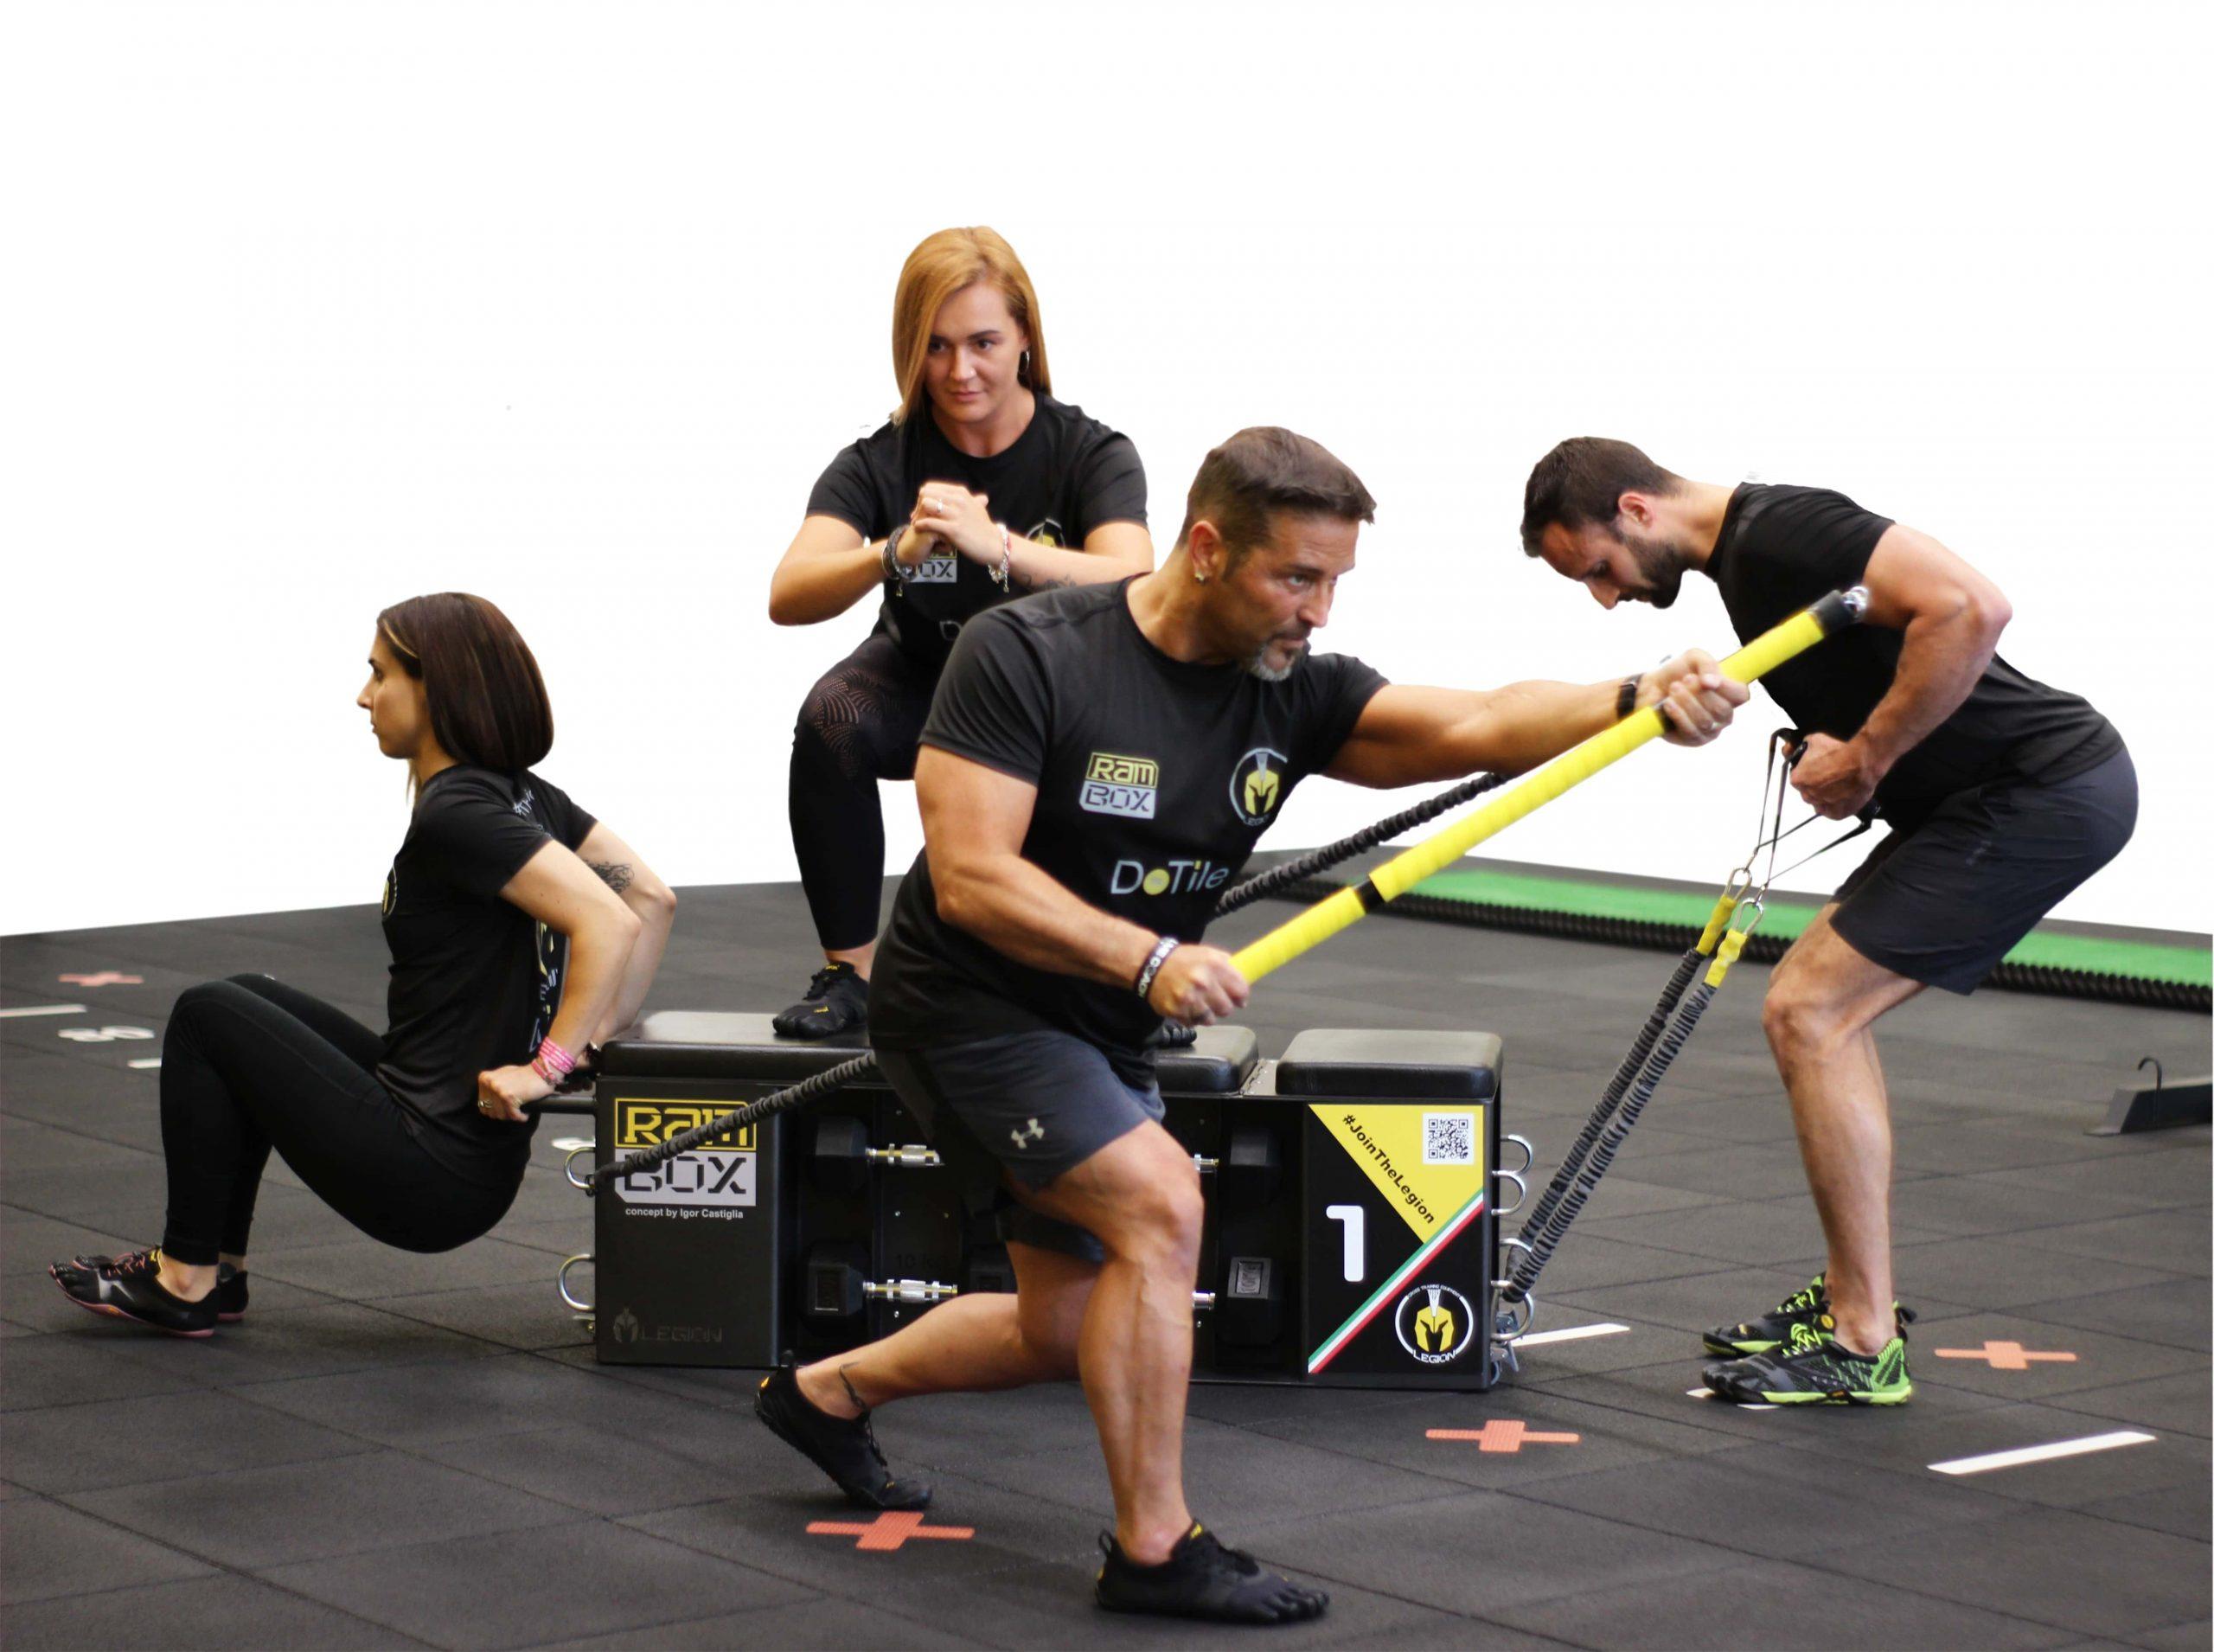 Training Gruppo DoTile RamBOX